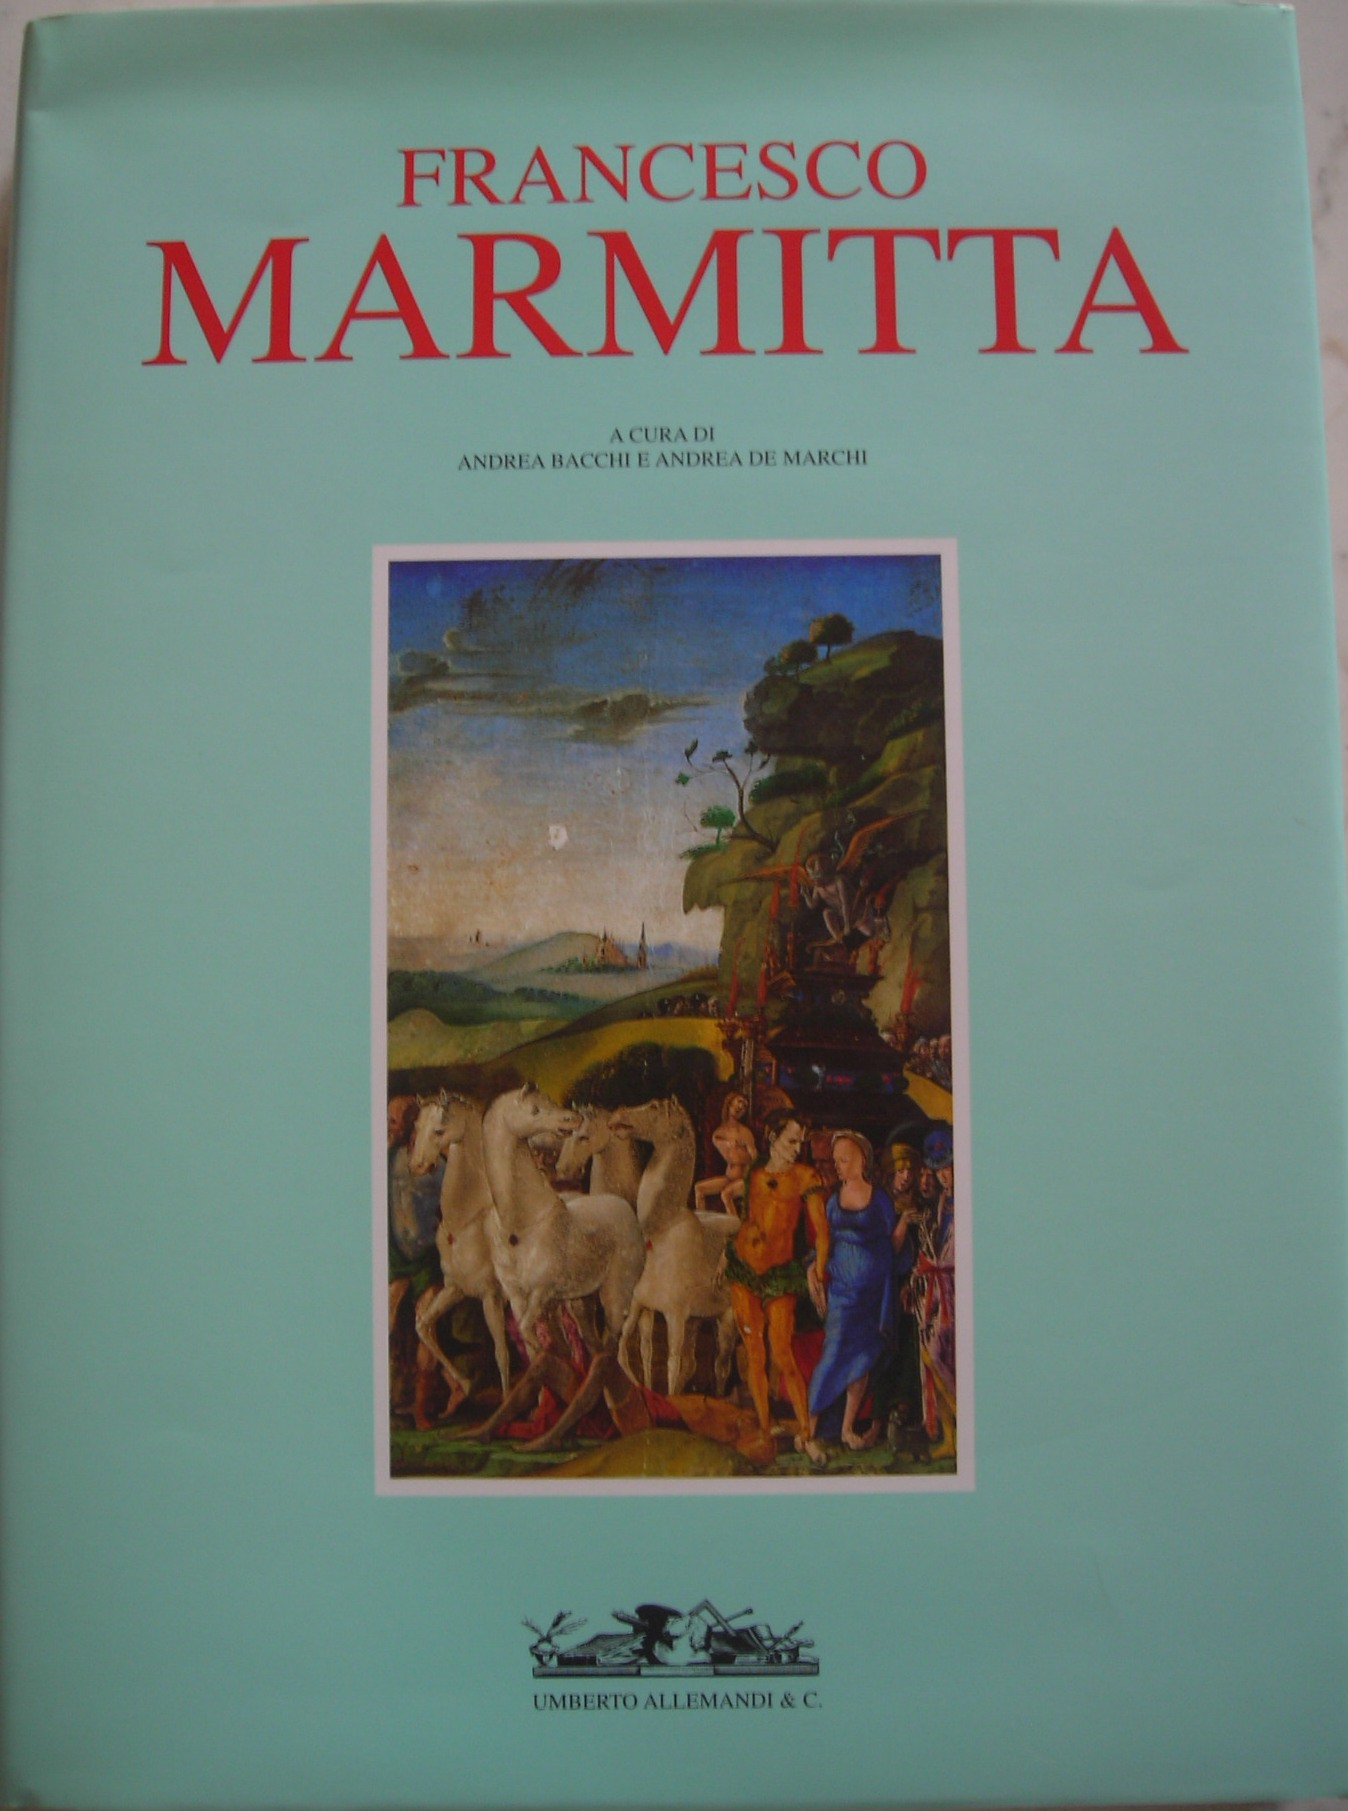 Francesco Marmitta